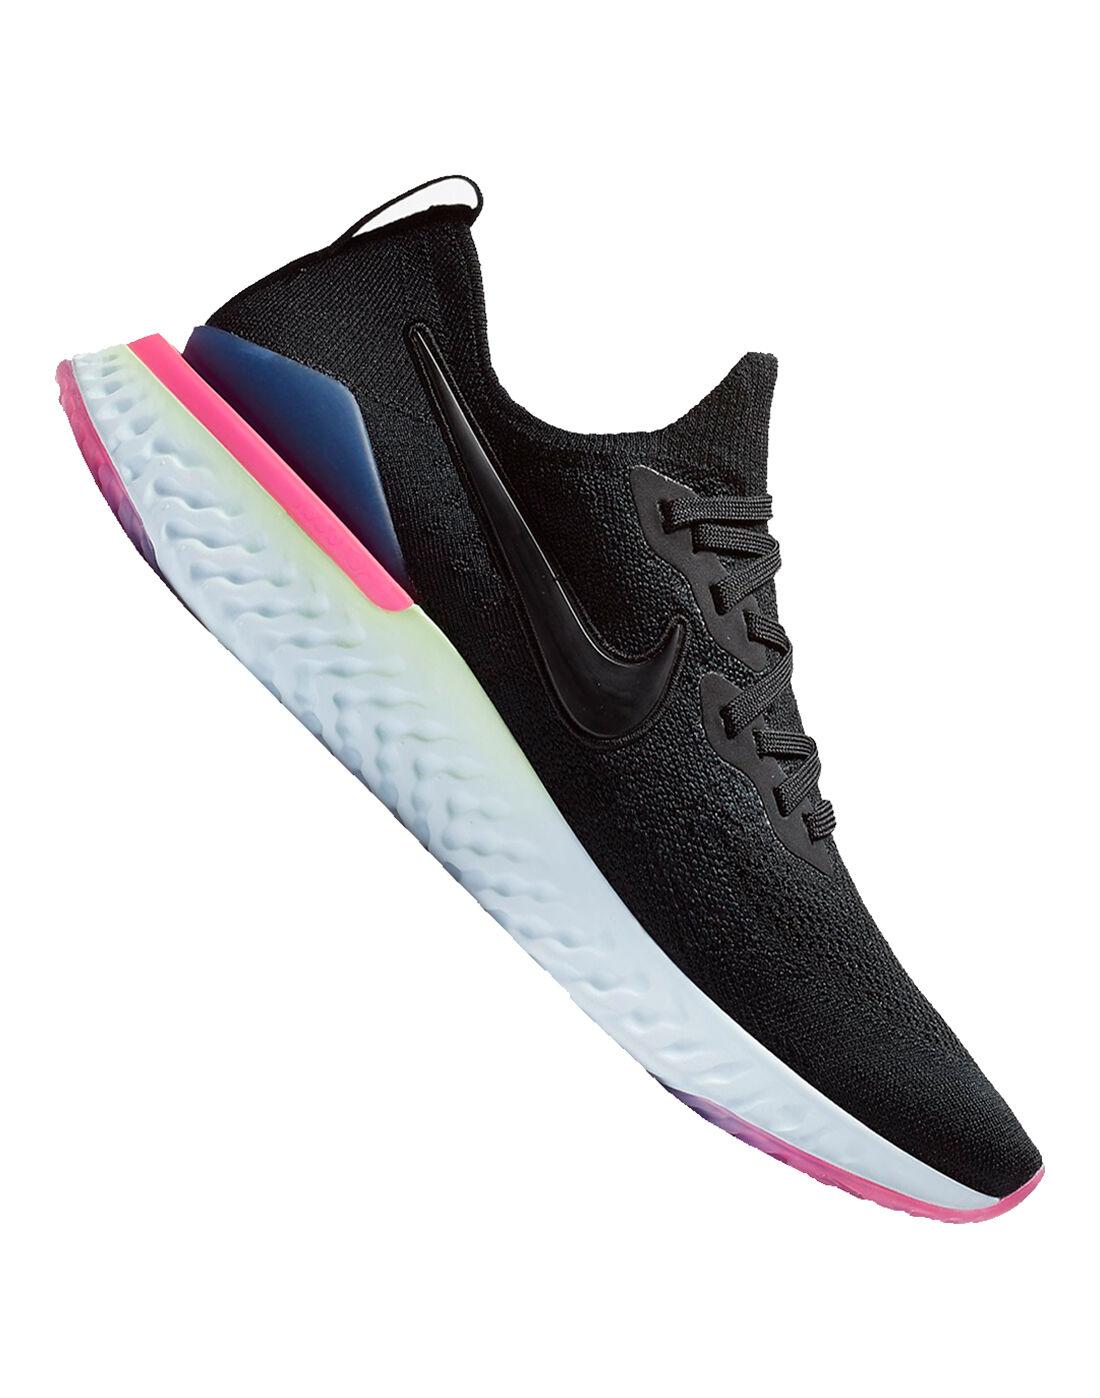 Men's Black Nike Epic React Flyknit 2